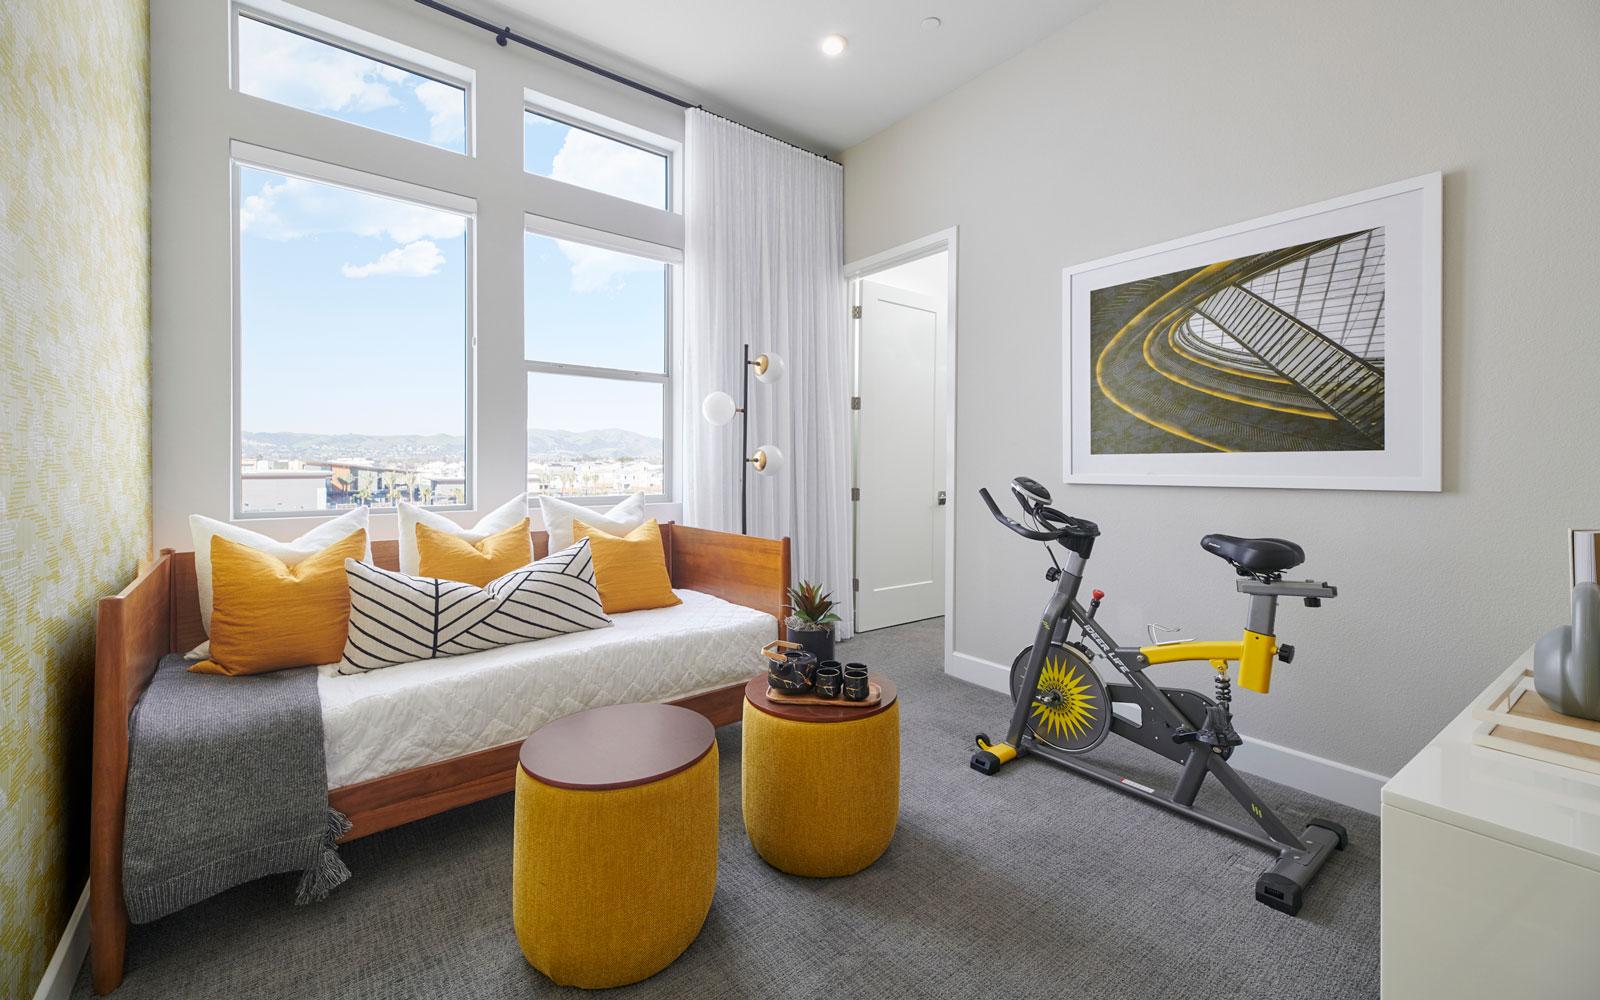 Bedroom 4 | Residence 2 | Hyde Park at Boulevard in Dublin, CA | Brookfield Residential